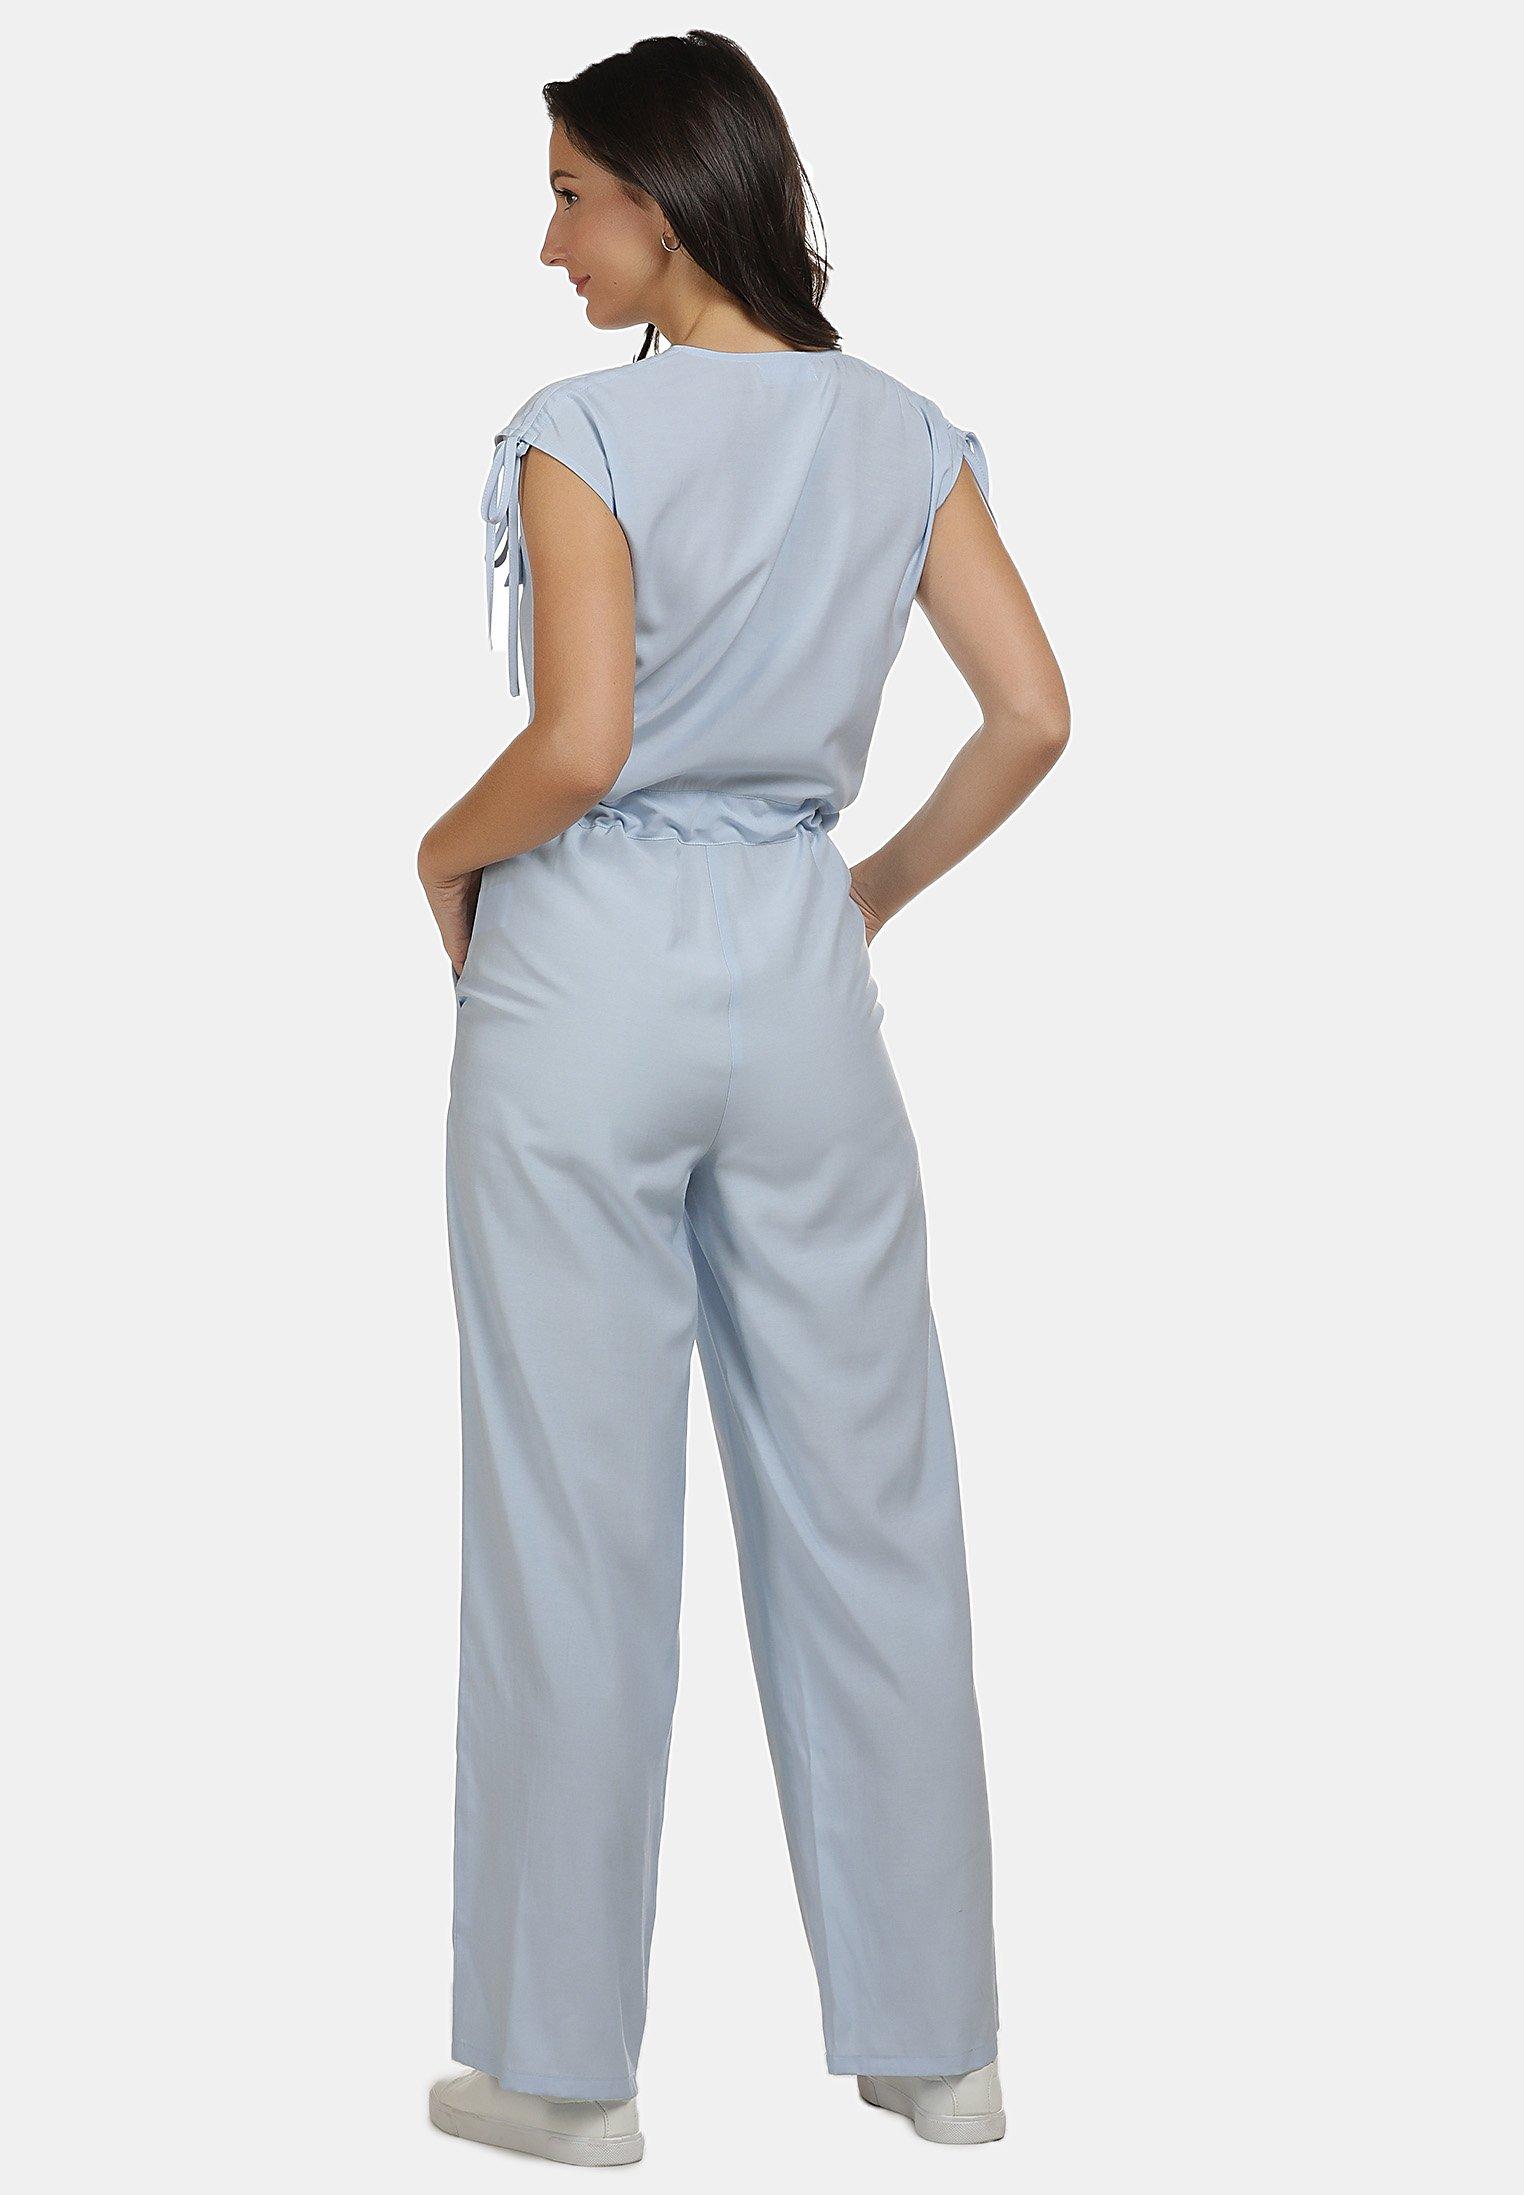 Factory Price Women's Clothing usha Jumpsuit hellblau oEwlKs9Y6